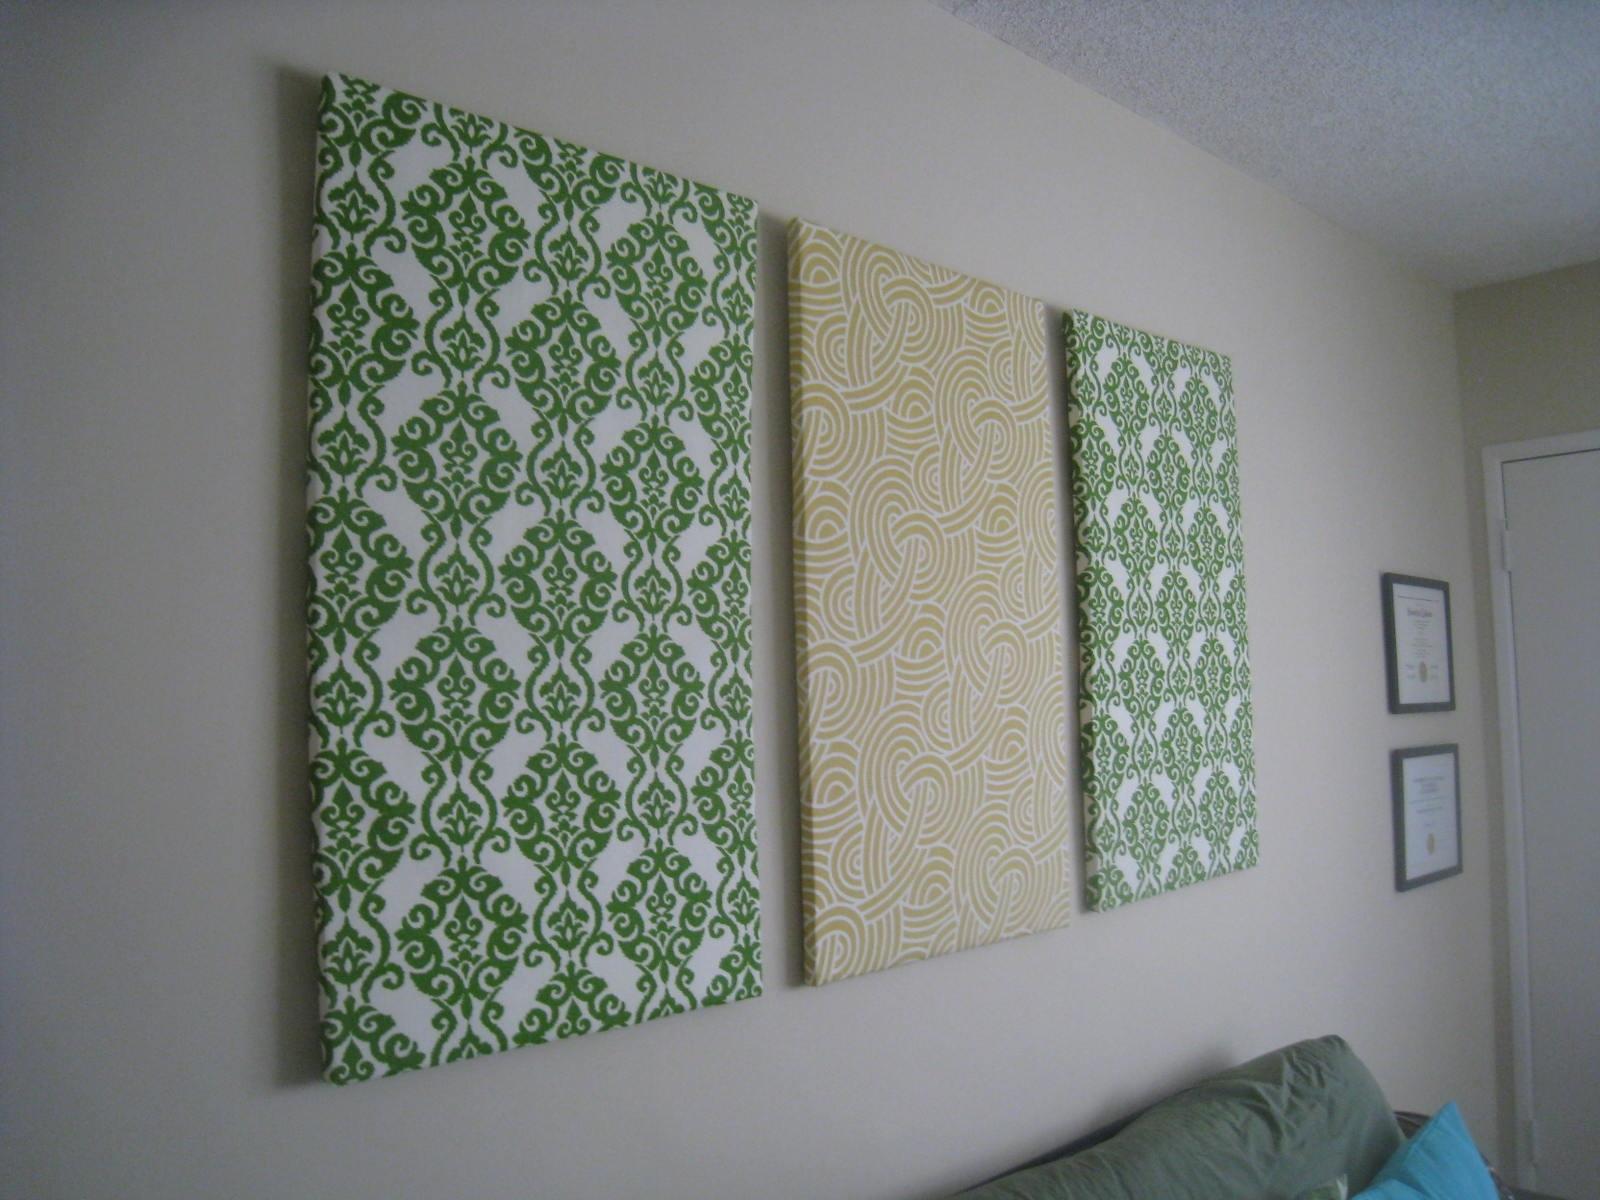 Art: Diy Fabric Wall Art With Regard To Newest Diy Fabric Wall Art Panels (View 10 of 15)